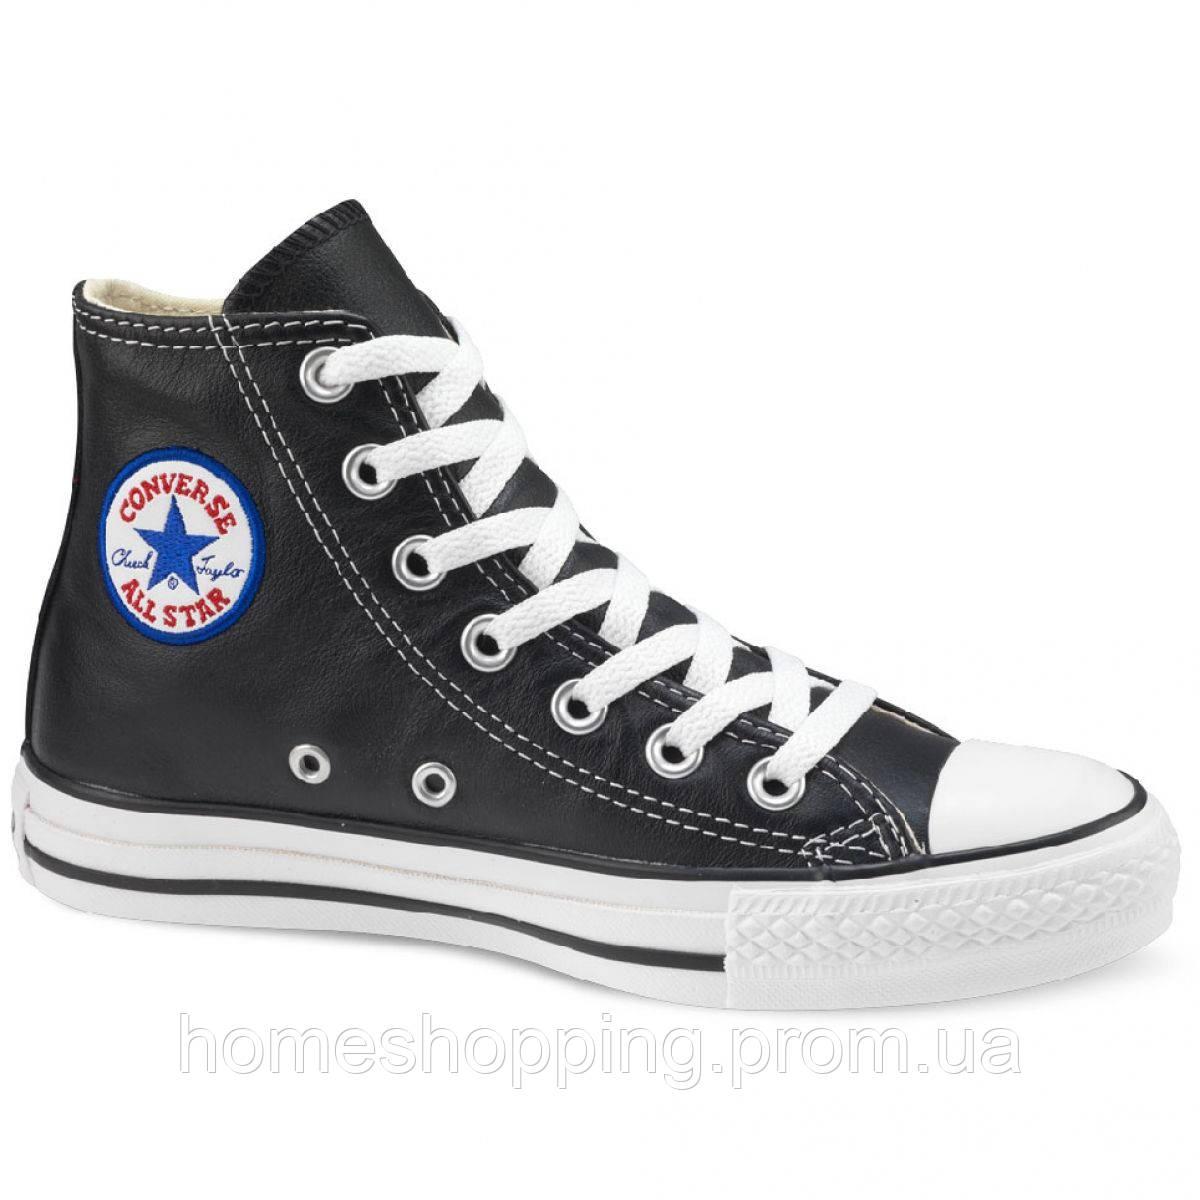 Женские Кеды Высокие Converse All Star